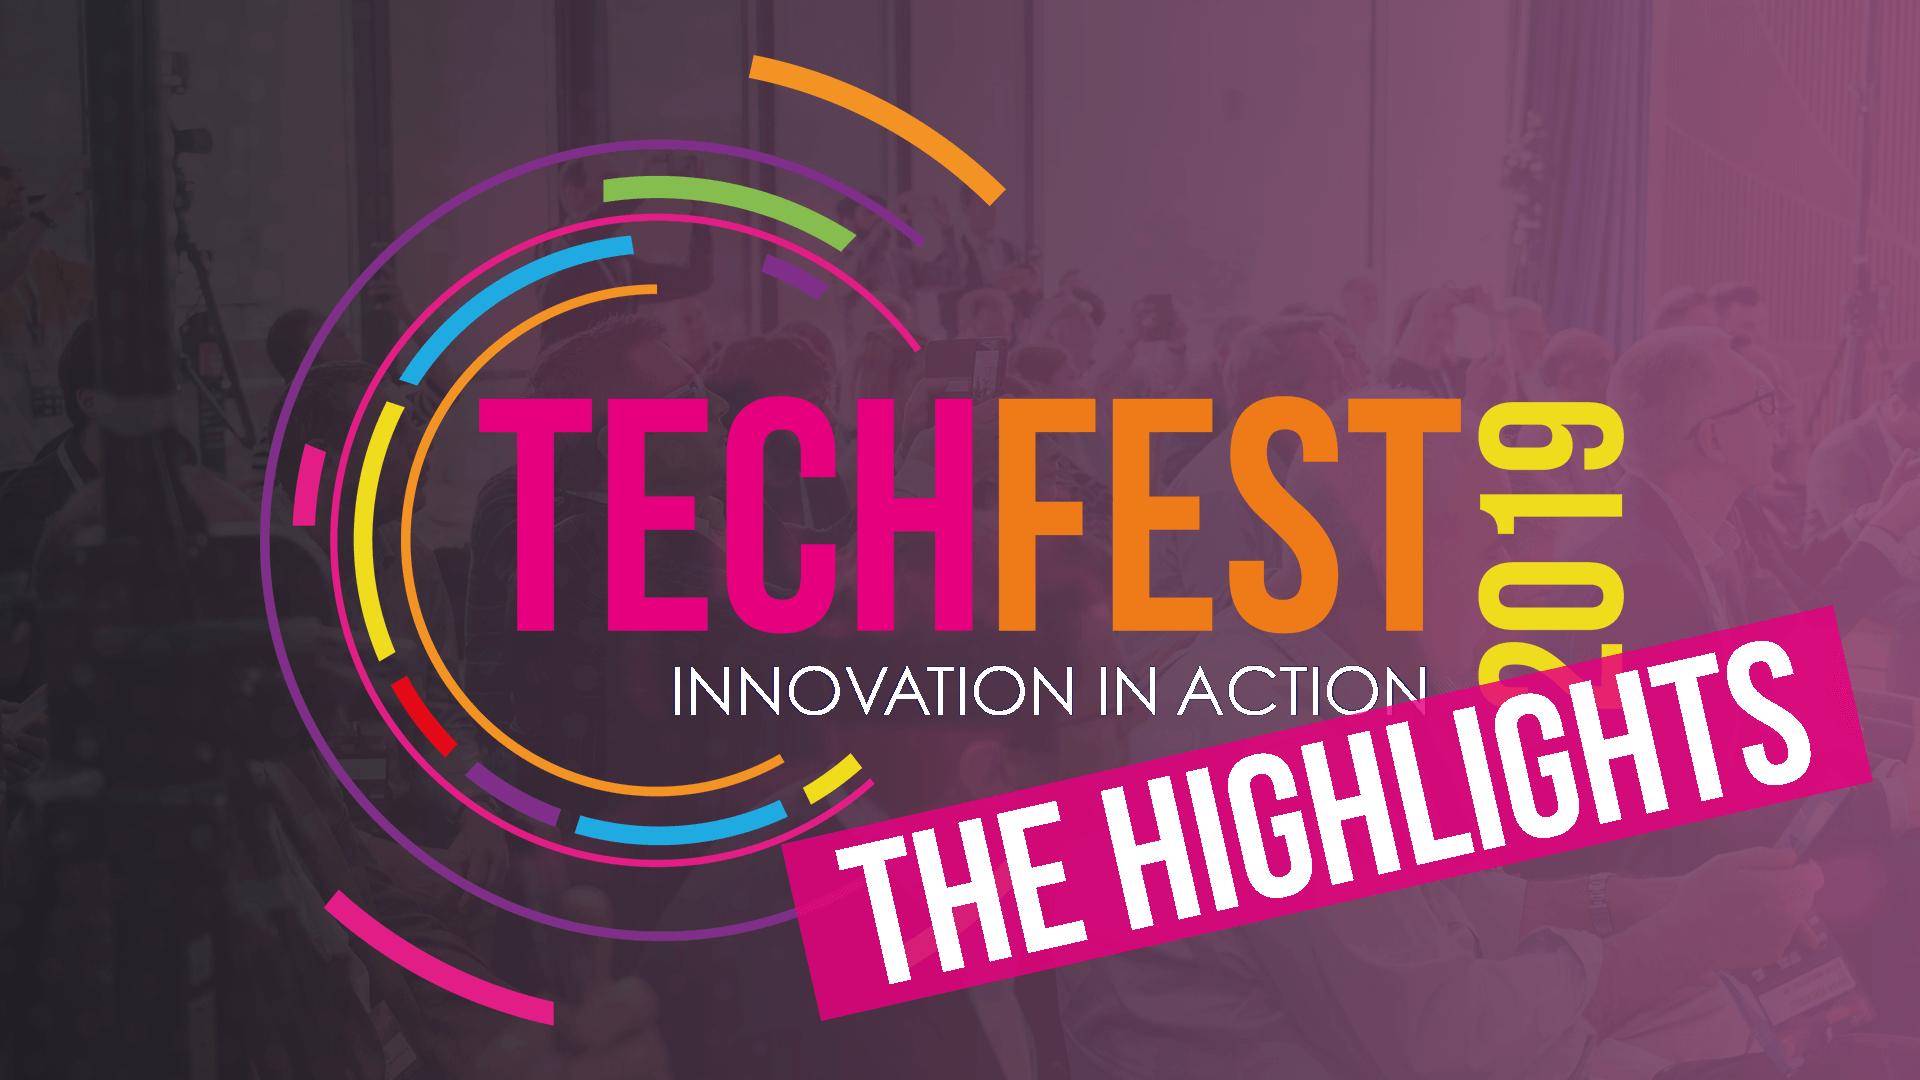 TechfestHighlights2019